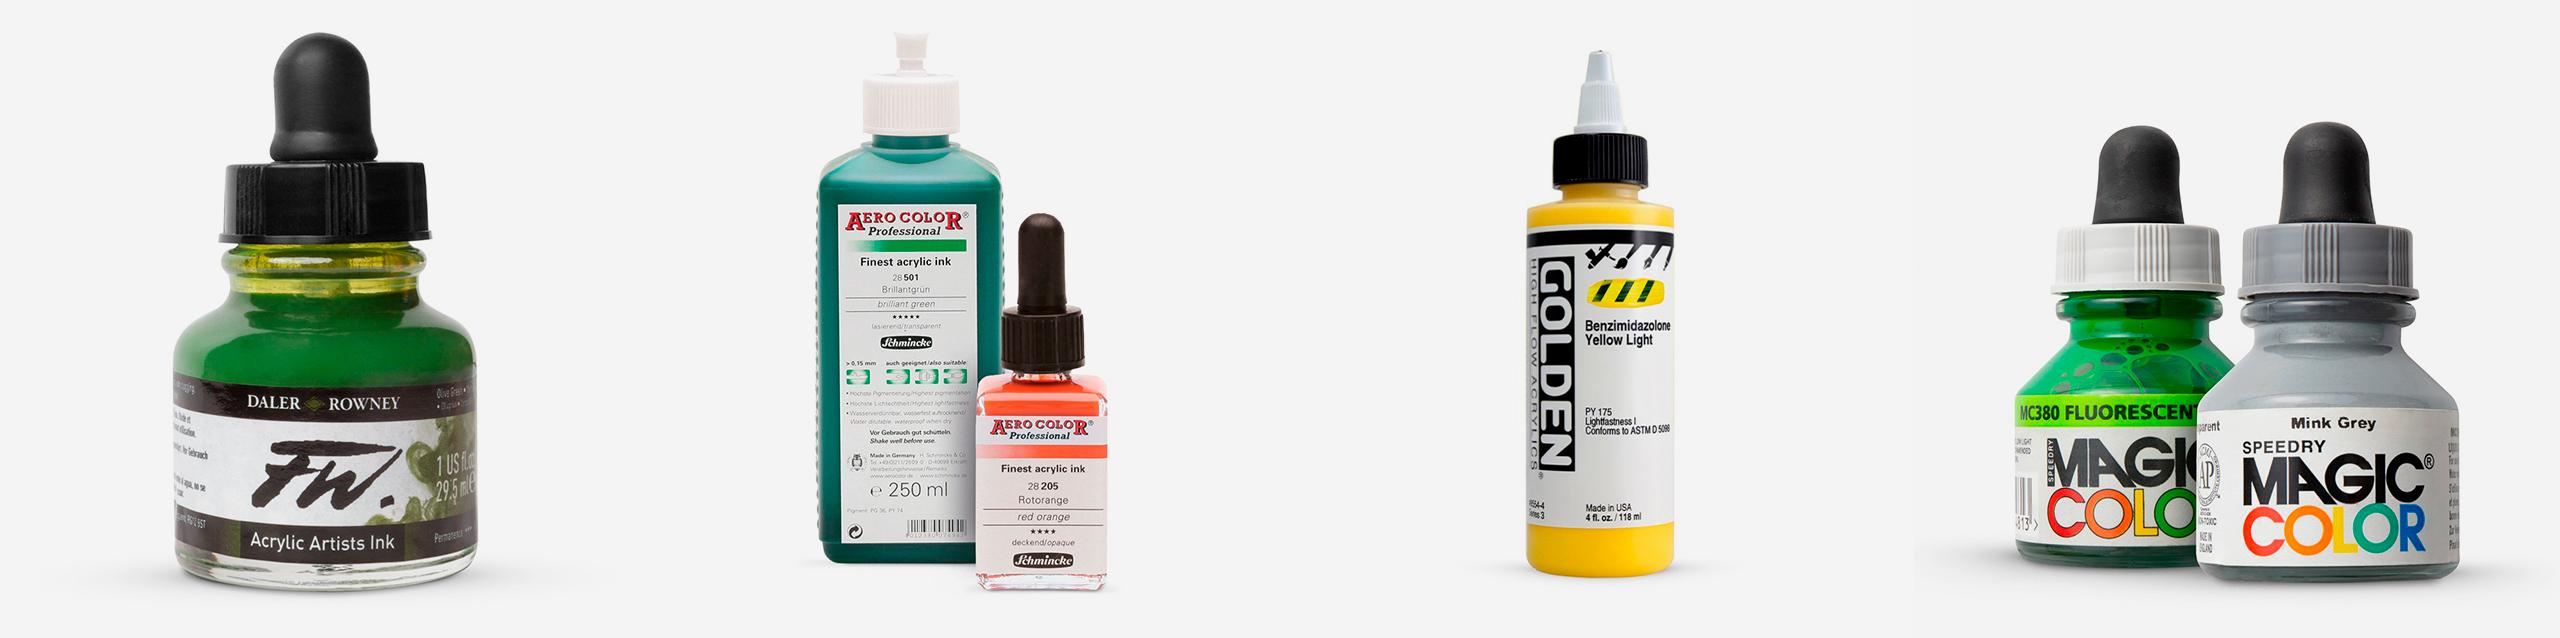 L-R: Daler Rowney FW Ink, Schmincke Aero Color Finest Acrylic Ink, GOLDEN High Flow Acrylic Paint, Speedry Magic Color Acrylic Ink